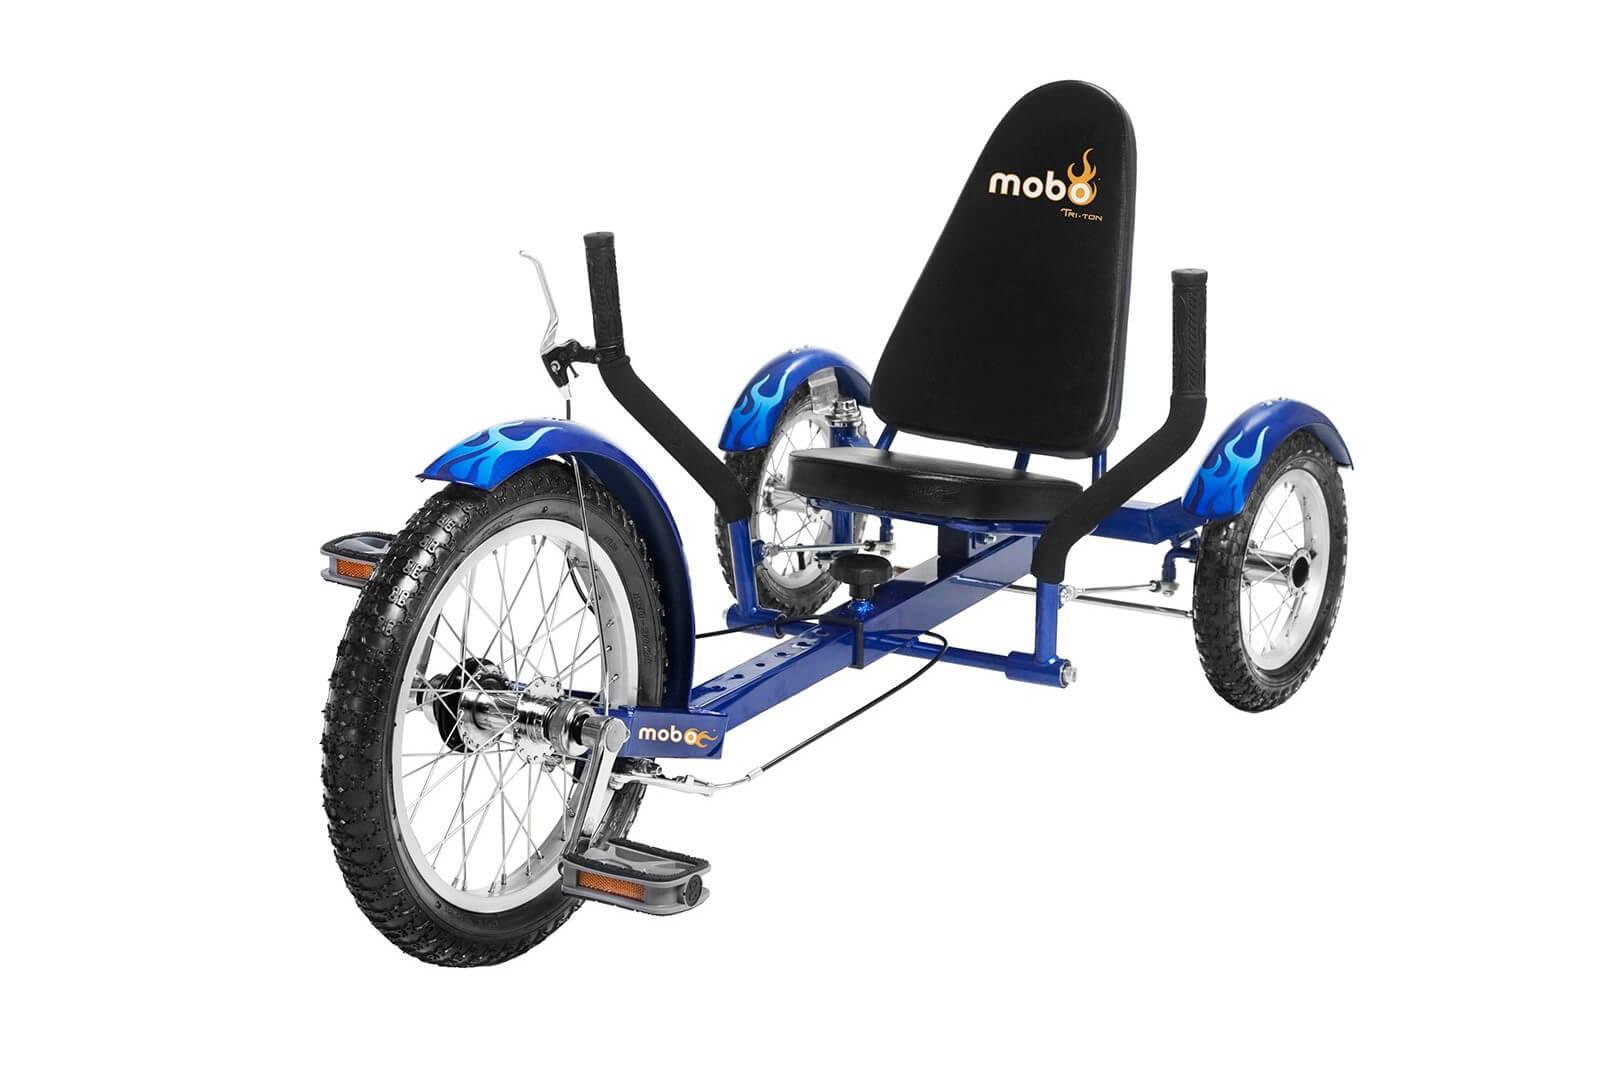 Mobo Triton bike